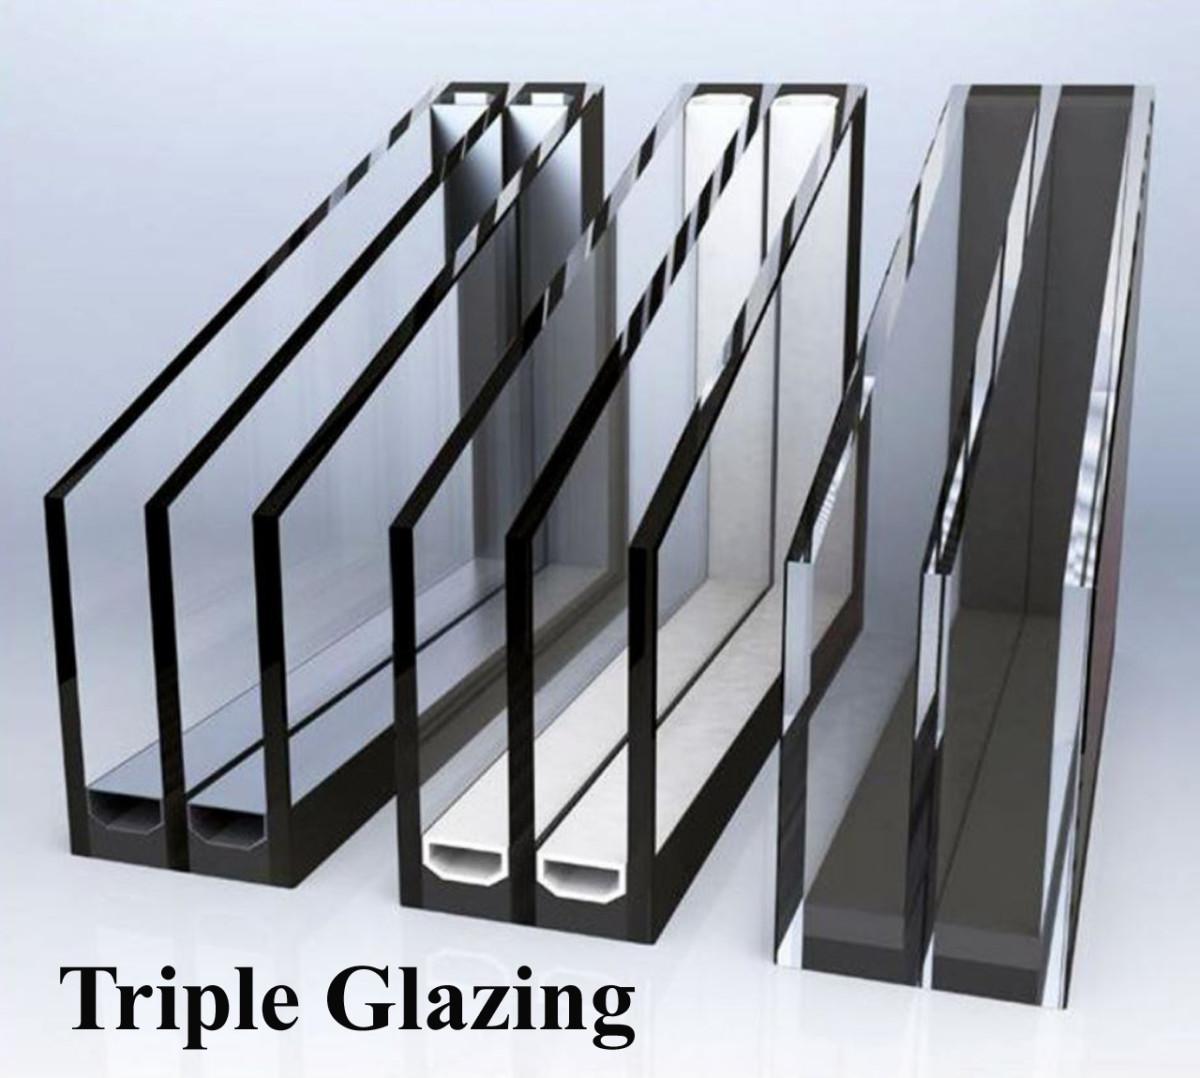 Should I buy Double Or Triple Glazed Windows